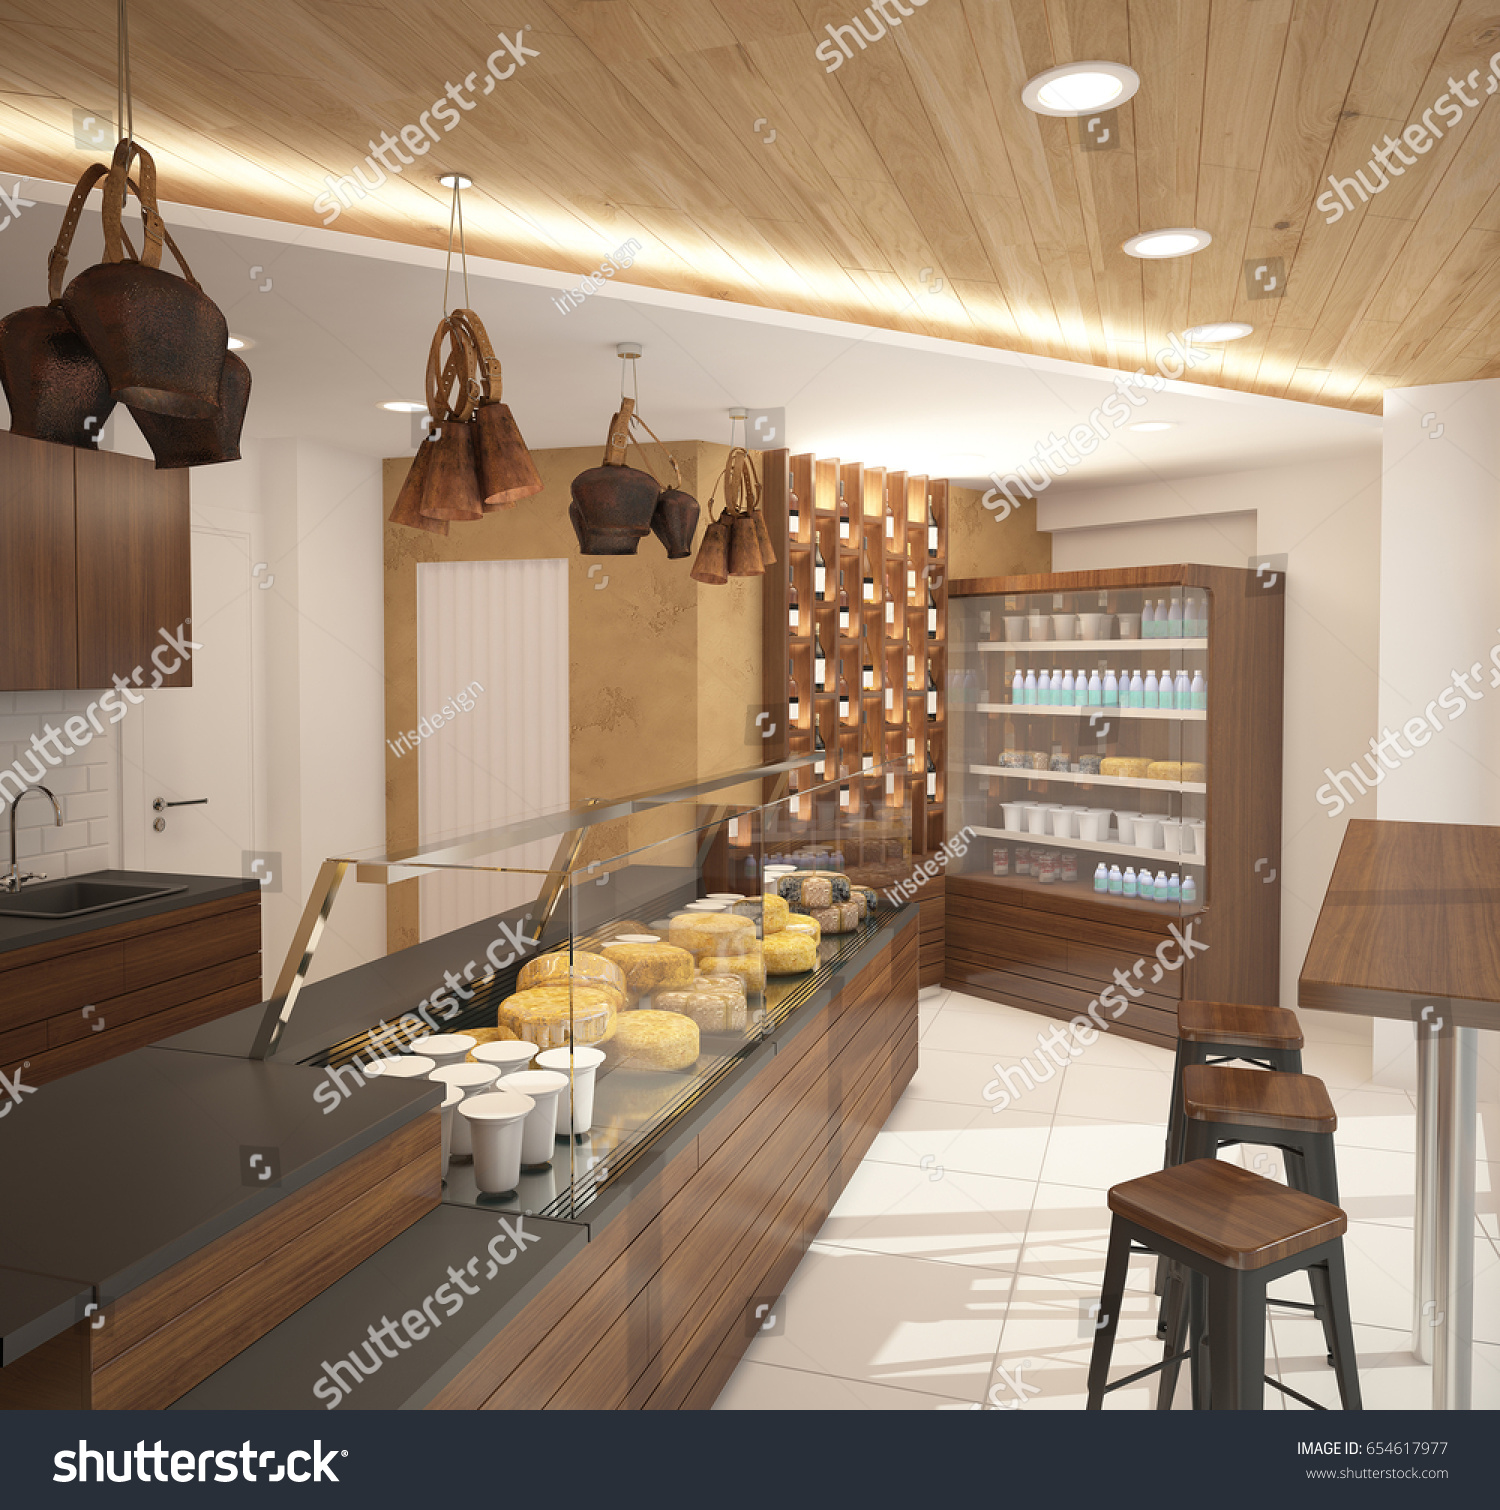 future la interior serac design of rendering the change can living architectural